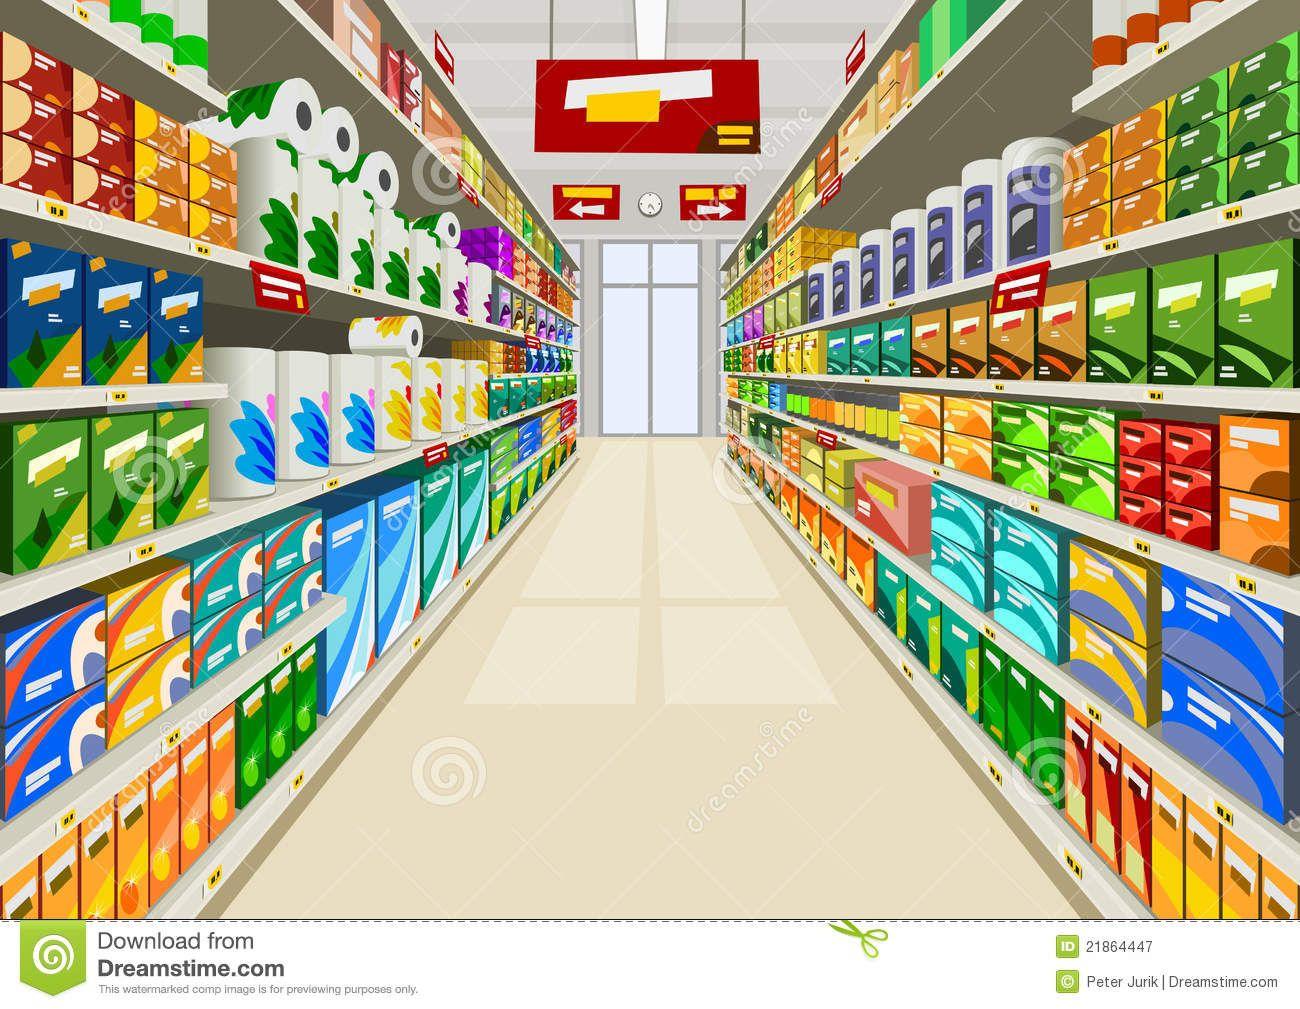 Mall clipart retail trade. Supermarket stock illustrations